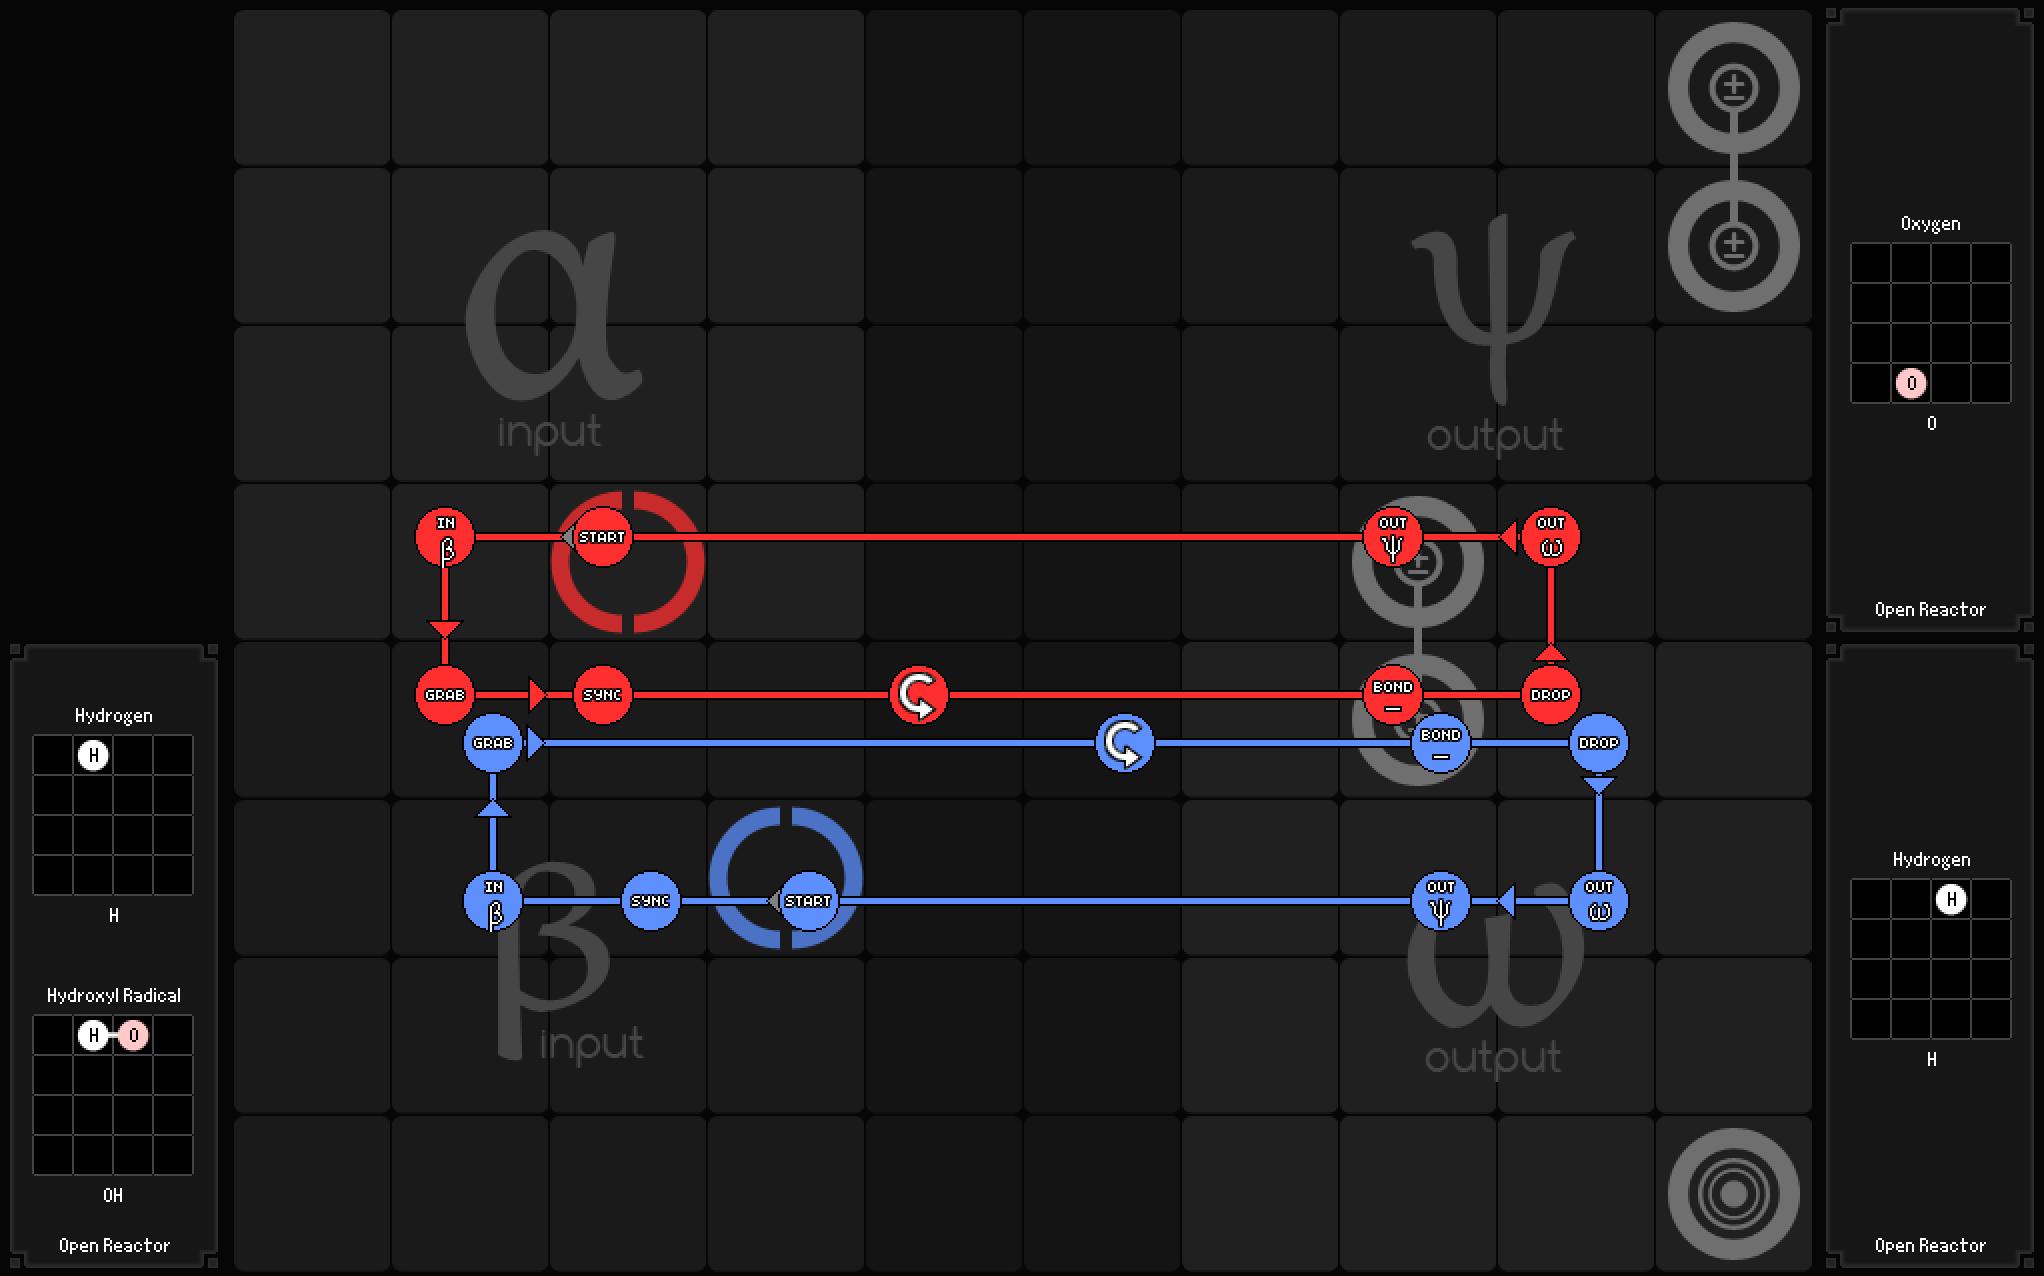 1_Story_Mode/5_Sikutar/SpaceChem-5.5.a/Reactor_2.png